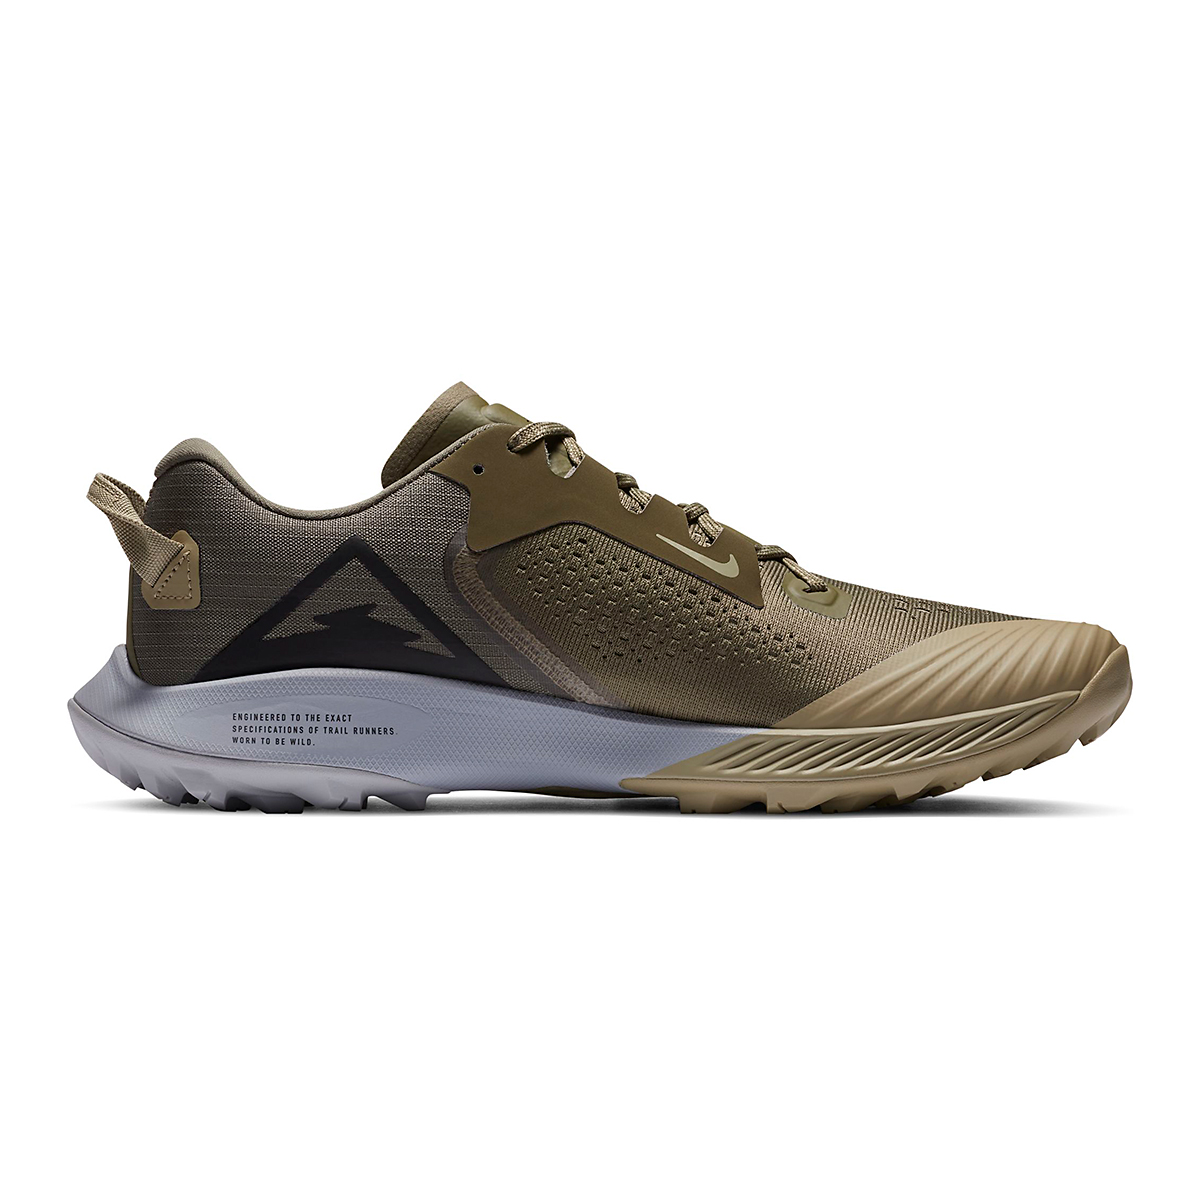 Men's Nike Air Zoom Terra Kiger 6 Trail Running Shoe - Color: Medium Olive/Medium Khaki/Wolf Grey/Black - Size: 6 - Width: Regular, Medium Olive/Medium Khaki/Wolf Grey/Black, large, image 2